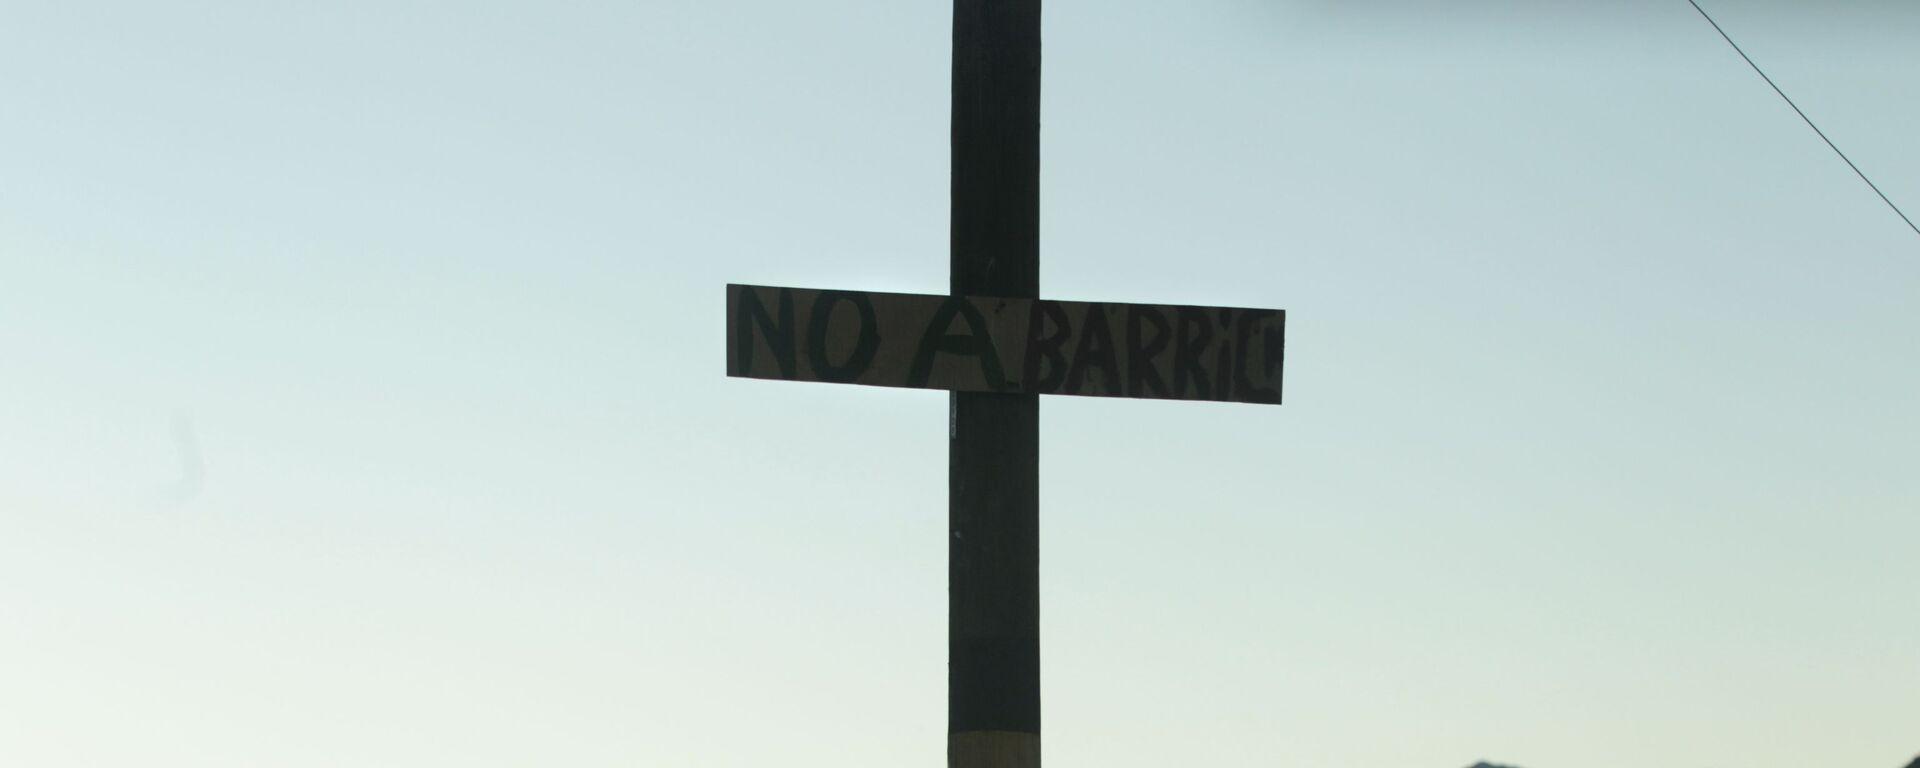 Una cruz que lleva el mensaje 'No a Barrick' cerca del proyecto Pascua-Lama de Barrick Gold Corp. en el norte de Chile - Sputnik Mundo, 1920, 13.01.2020